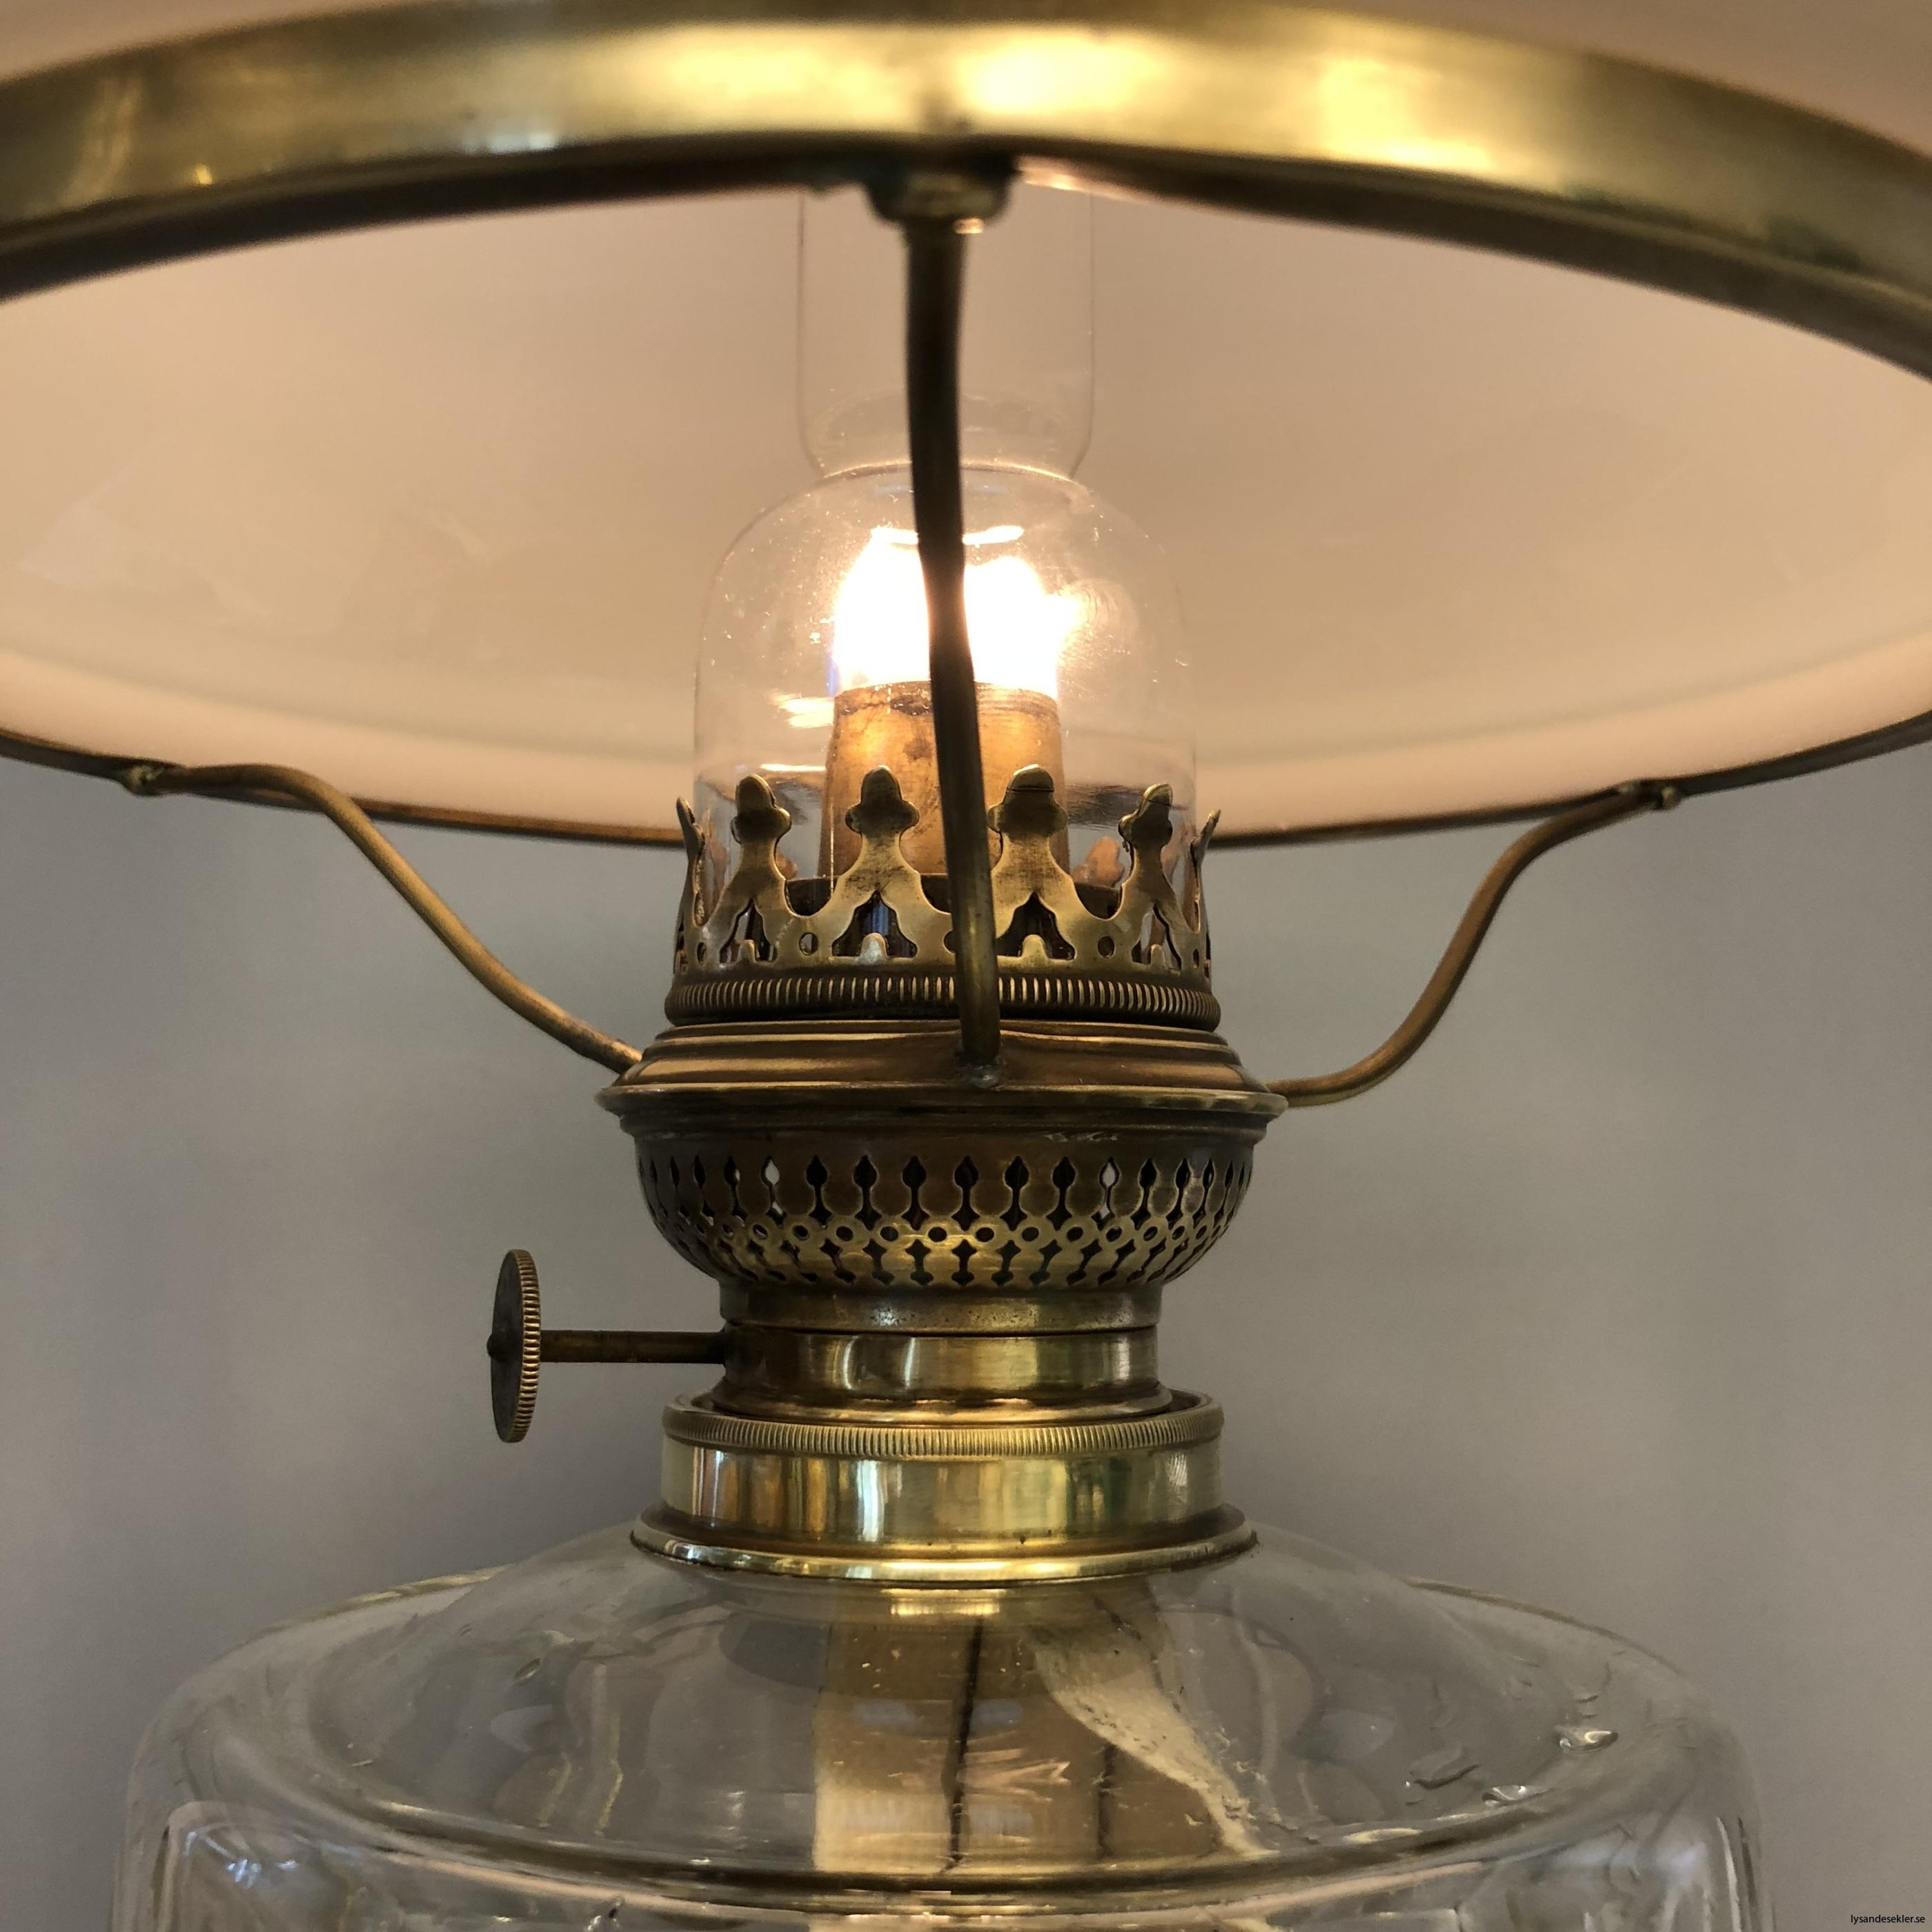 fotogenlampa fotogenlampor renoverad antik154